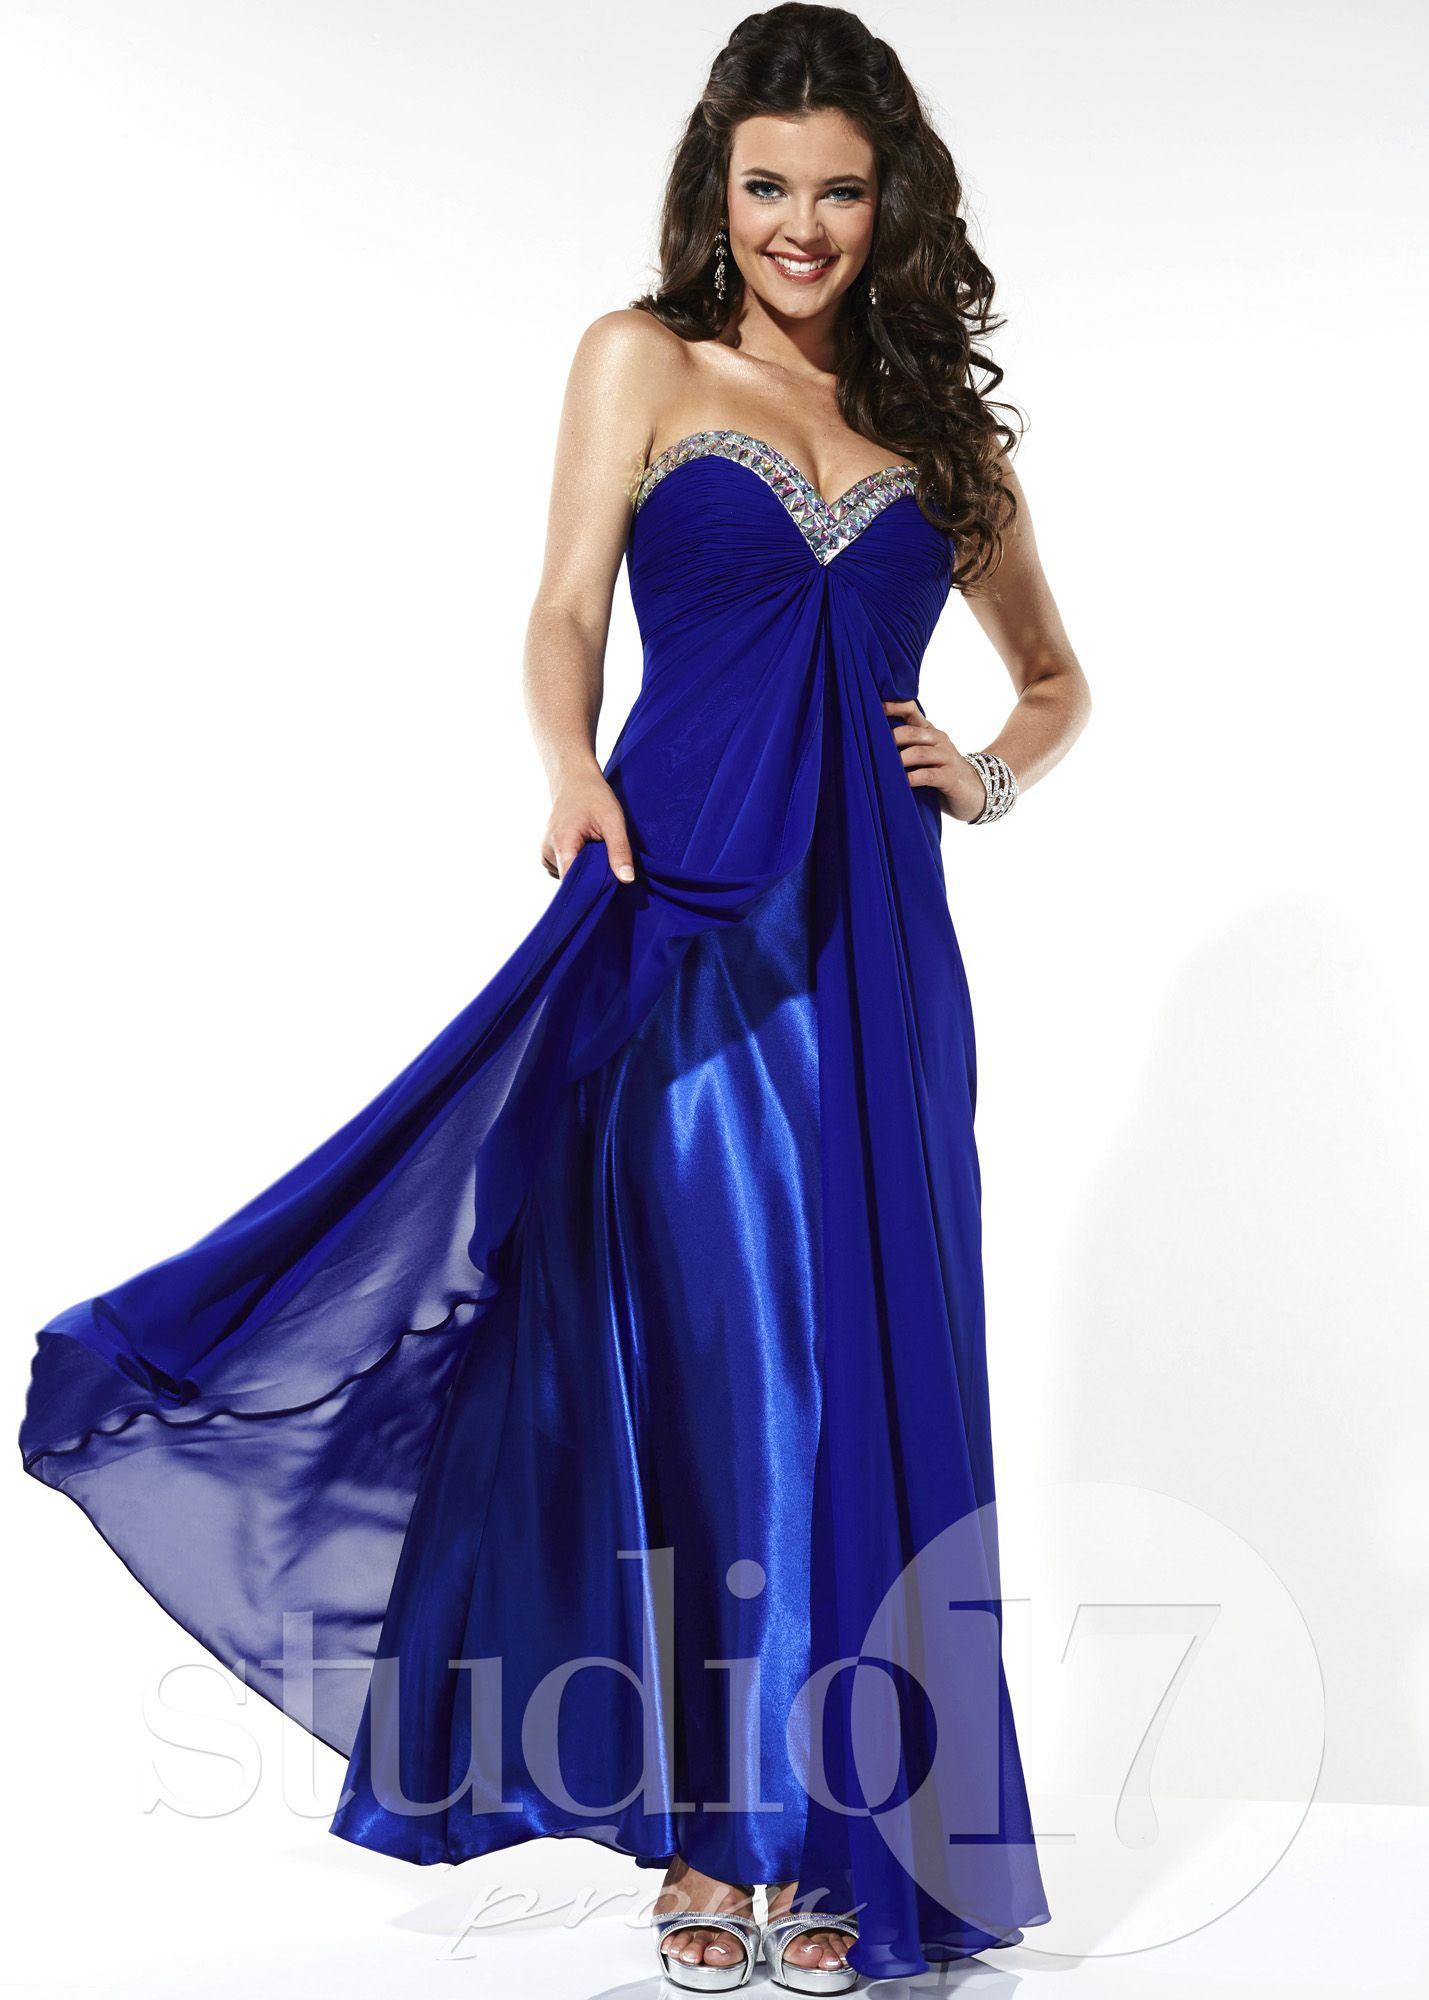 Studio royal blue strapless chiffon prom dresses online